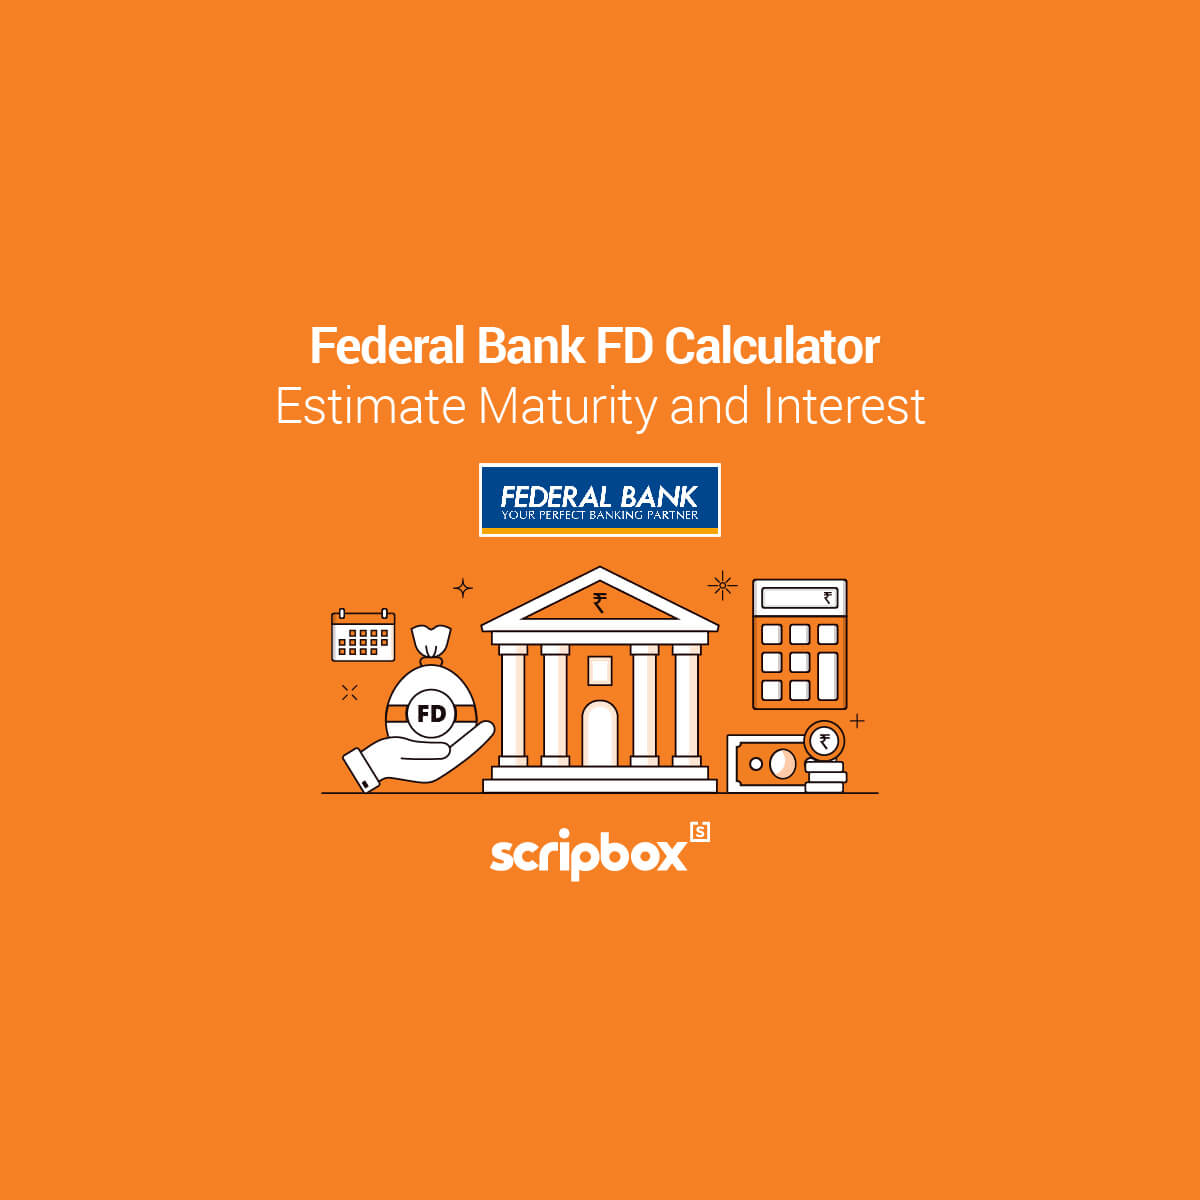 federal bank fd calculator